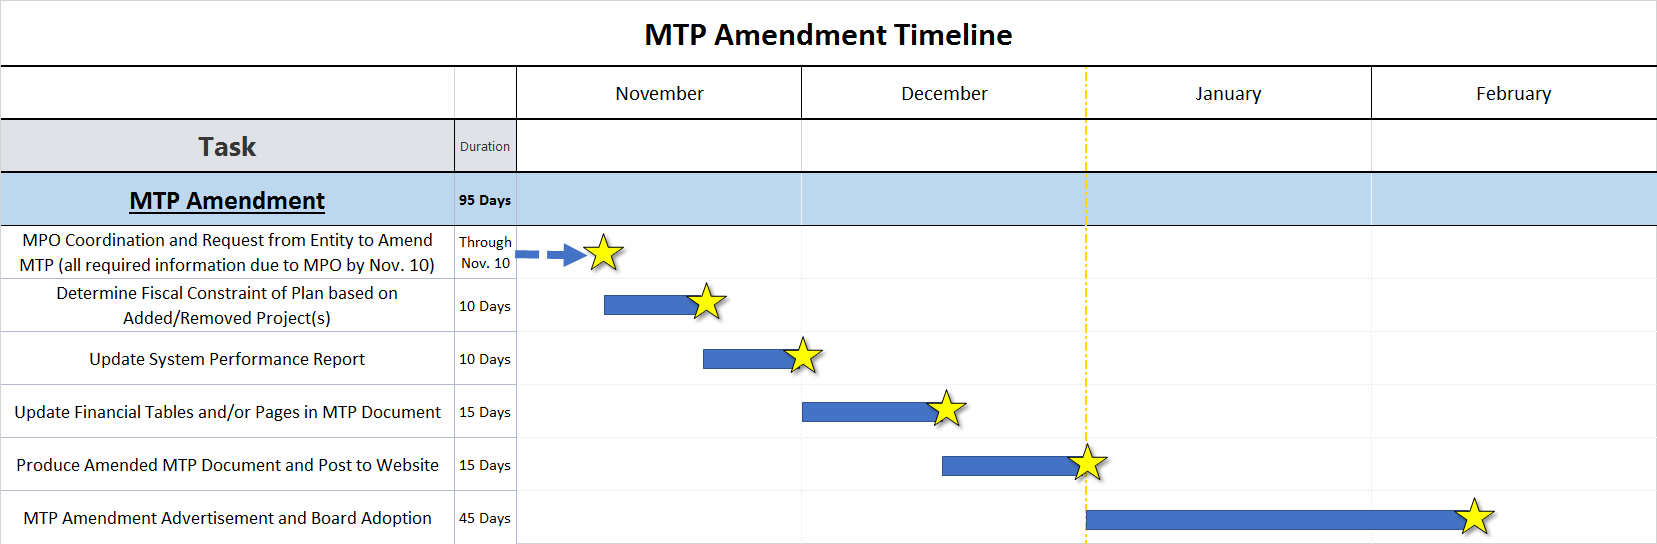 2045 MTP Amendment Timeline